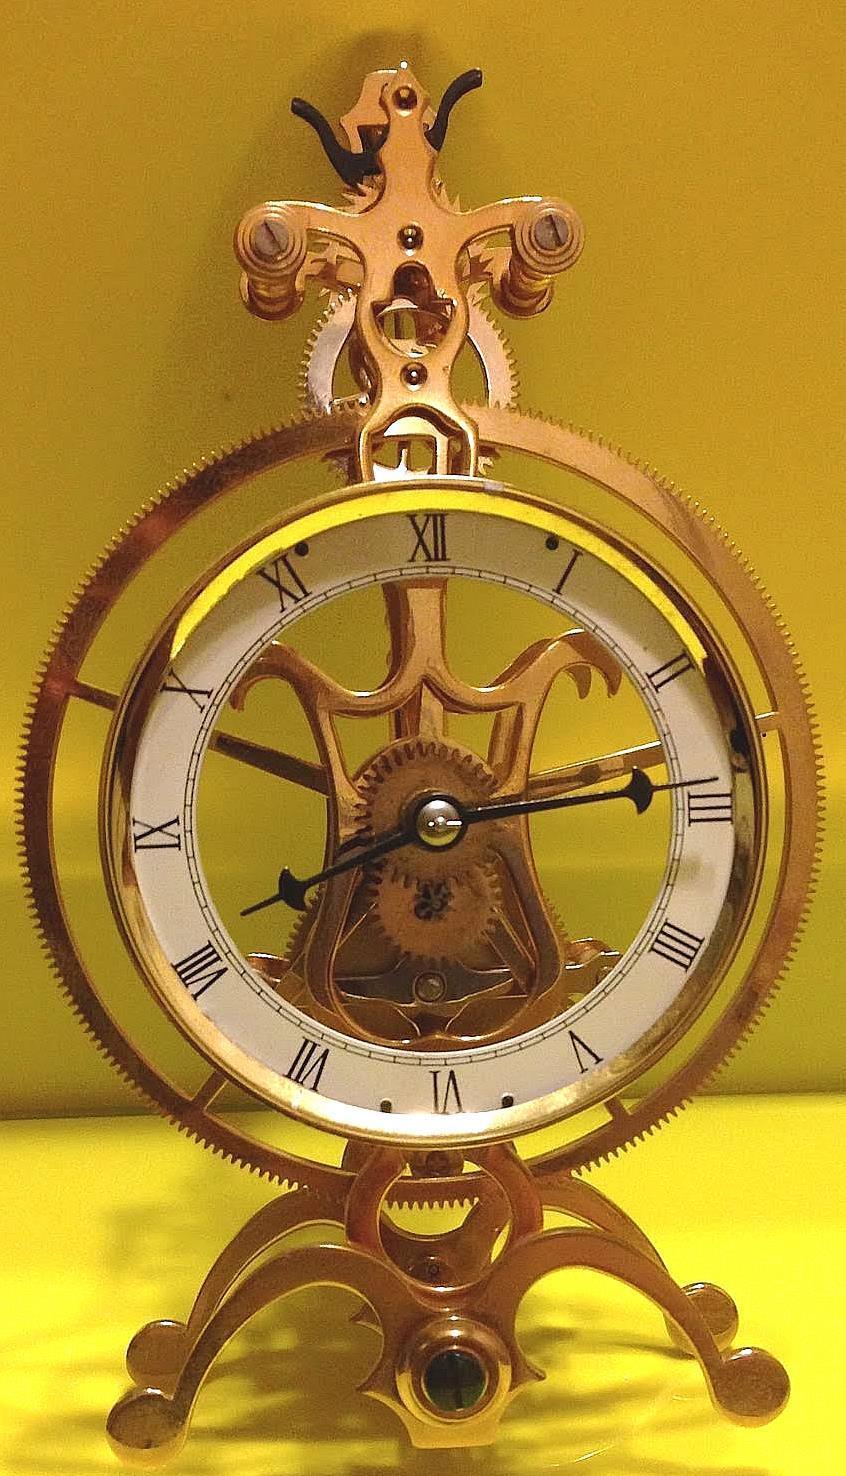 Great Wheel mini Skeleton Clock Kit--Assemble Your Own Skeleton Clock